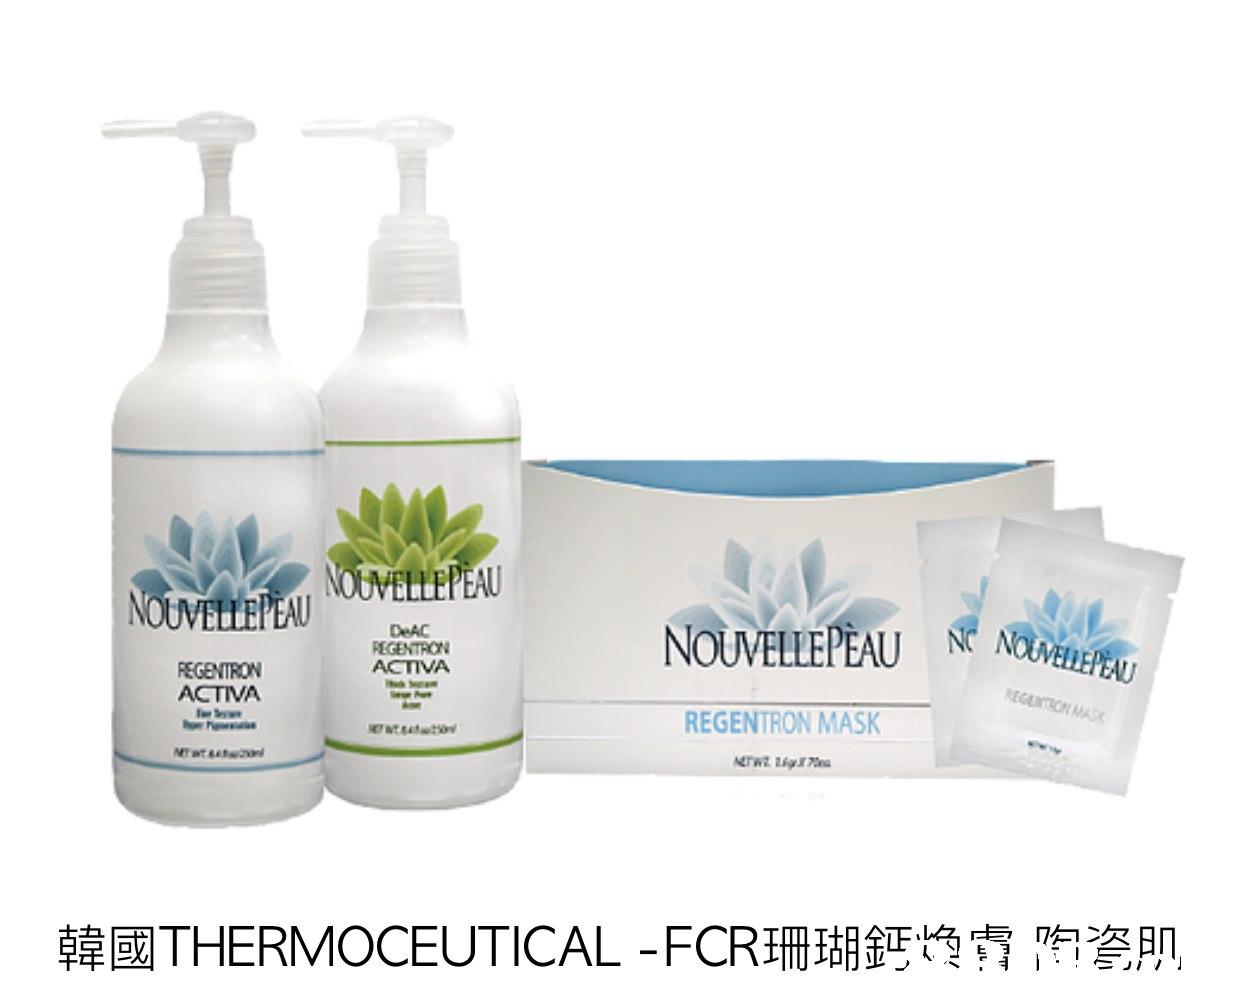 NOUVELLEPEAU DeAC ACTIVA REGENTRON ACTIVA REGENTRON MASK 韓國THERMOCEUTICAL-FOR珊瑚鈣煥字17 瓷肌  product,product,skin care,lotion,liquid